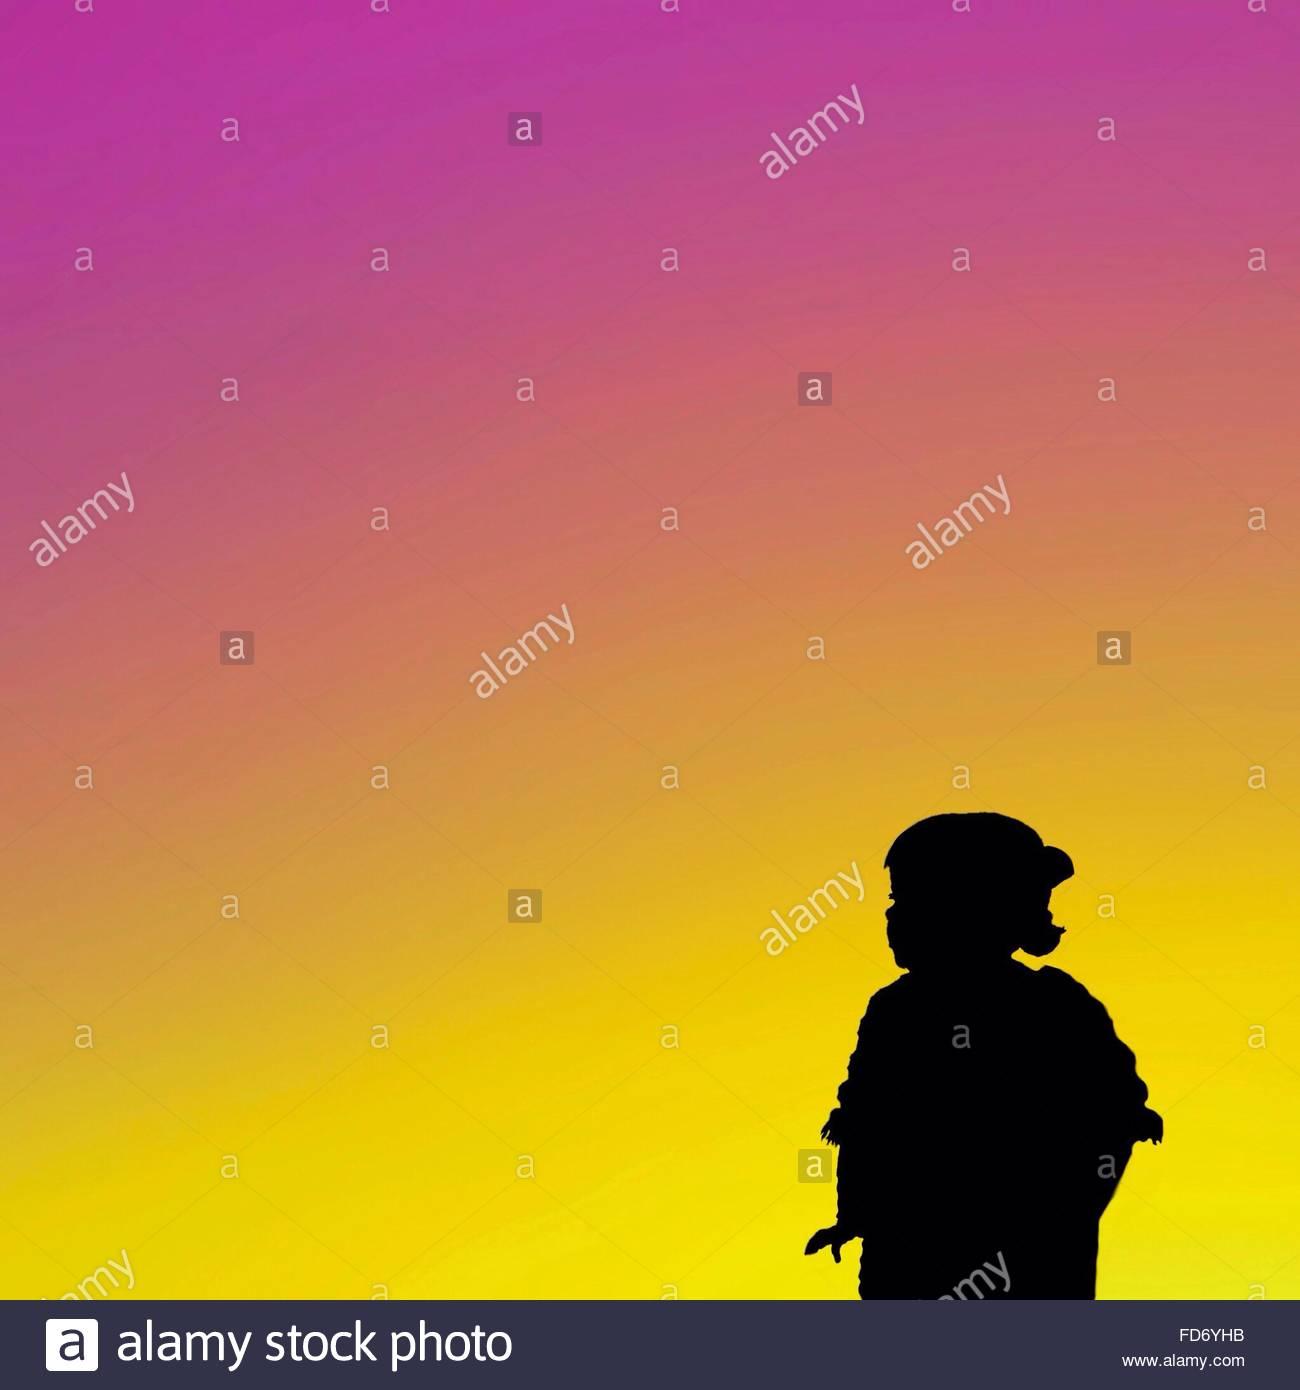 Silhouette-Mädchen gegen dramatischer Himmel Stockbild